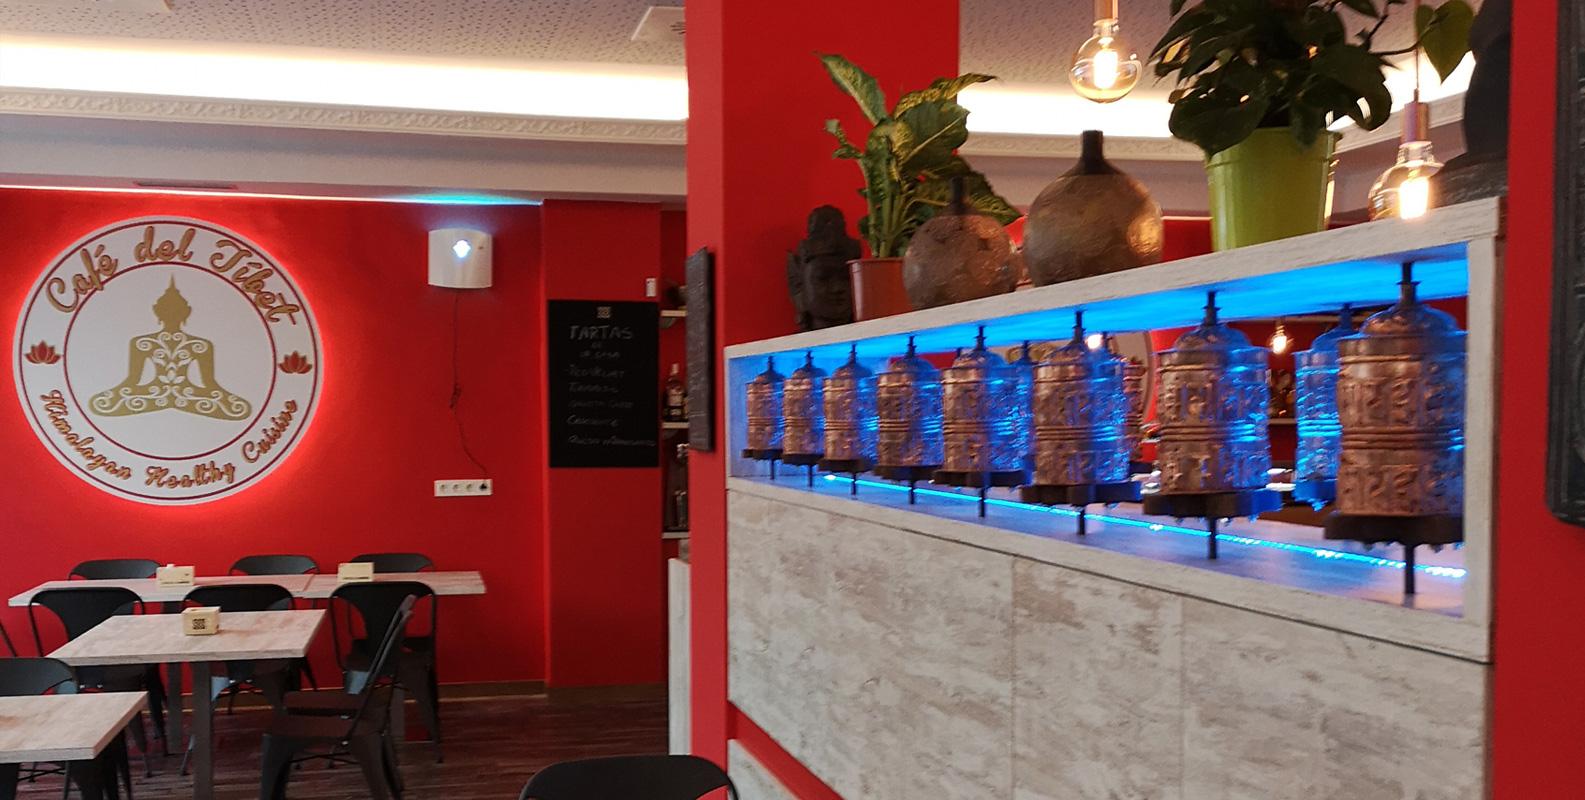 Franquicias de los Restaurantes Café del Tíbet. Zurita 4 y Gómez Laguna 22, Zaragoza. Deliciosa cocina nepalí, tibetana e hindú con bases mediterráneas.